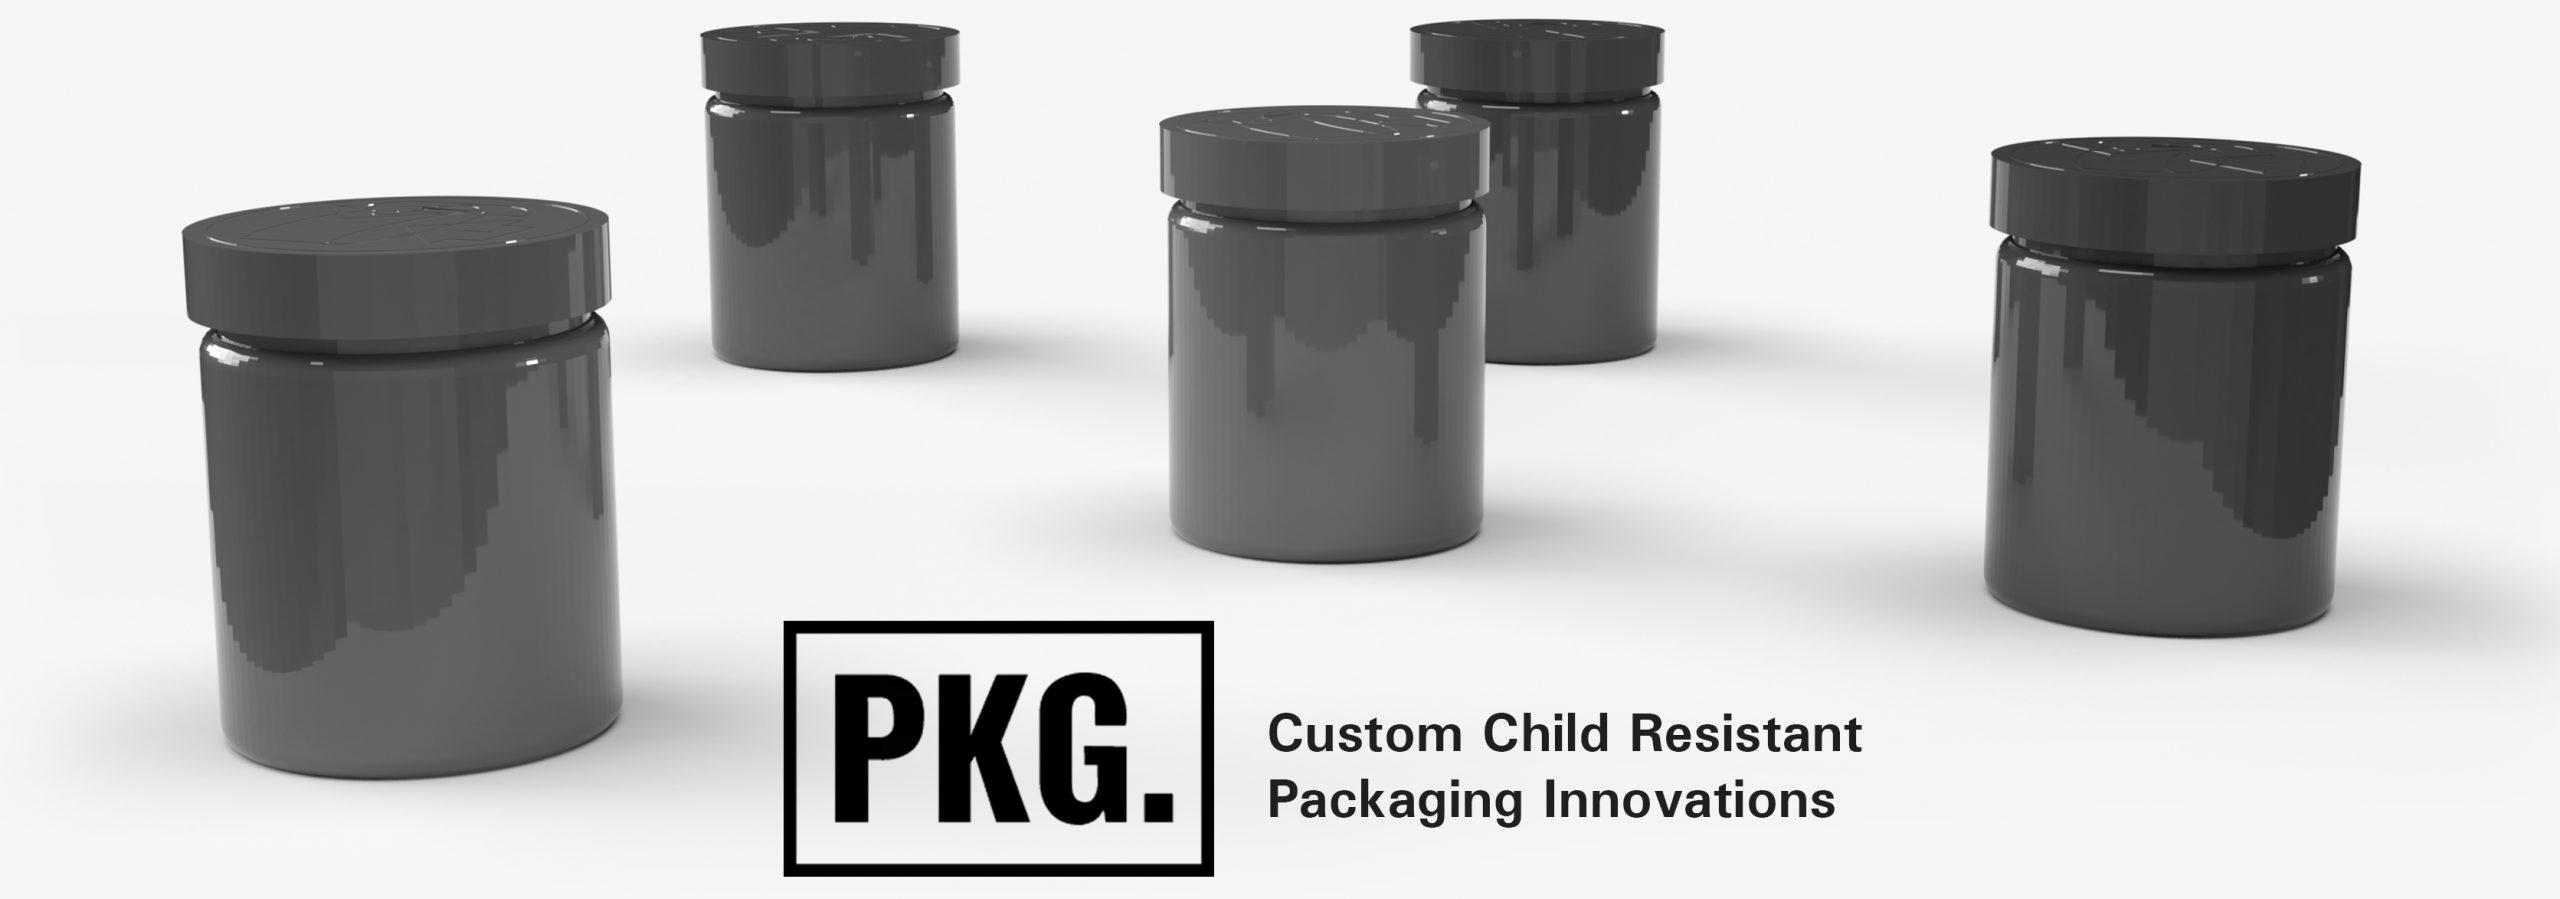 PKG - Child-Resistant Packaging Solutions